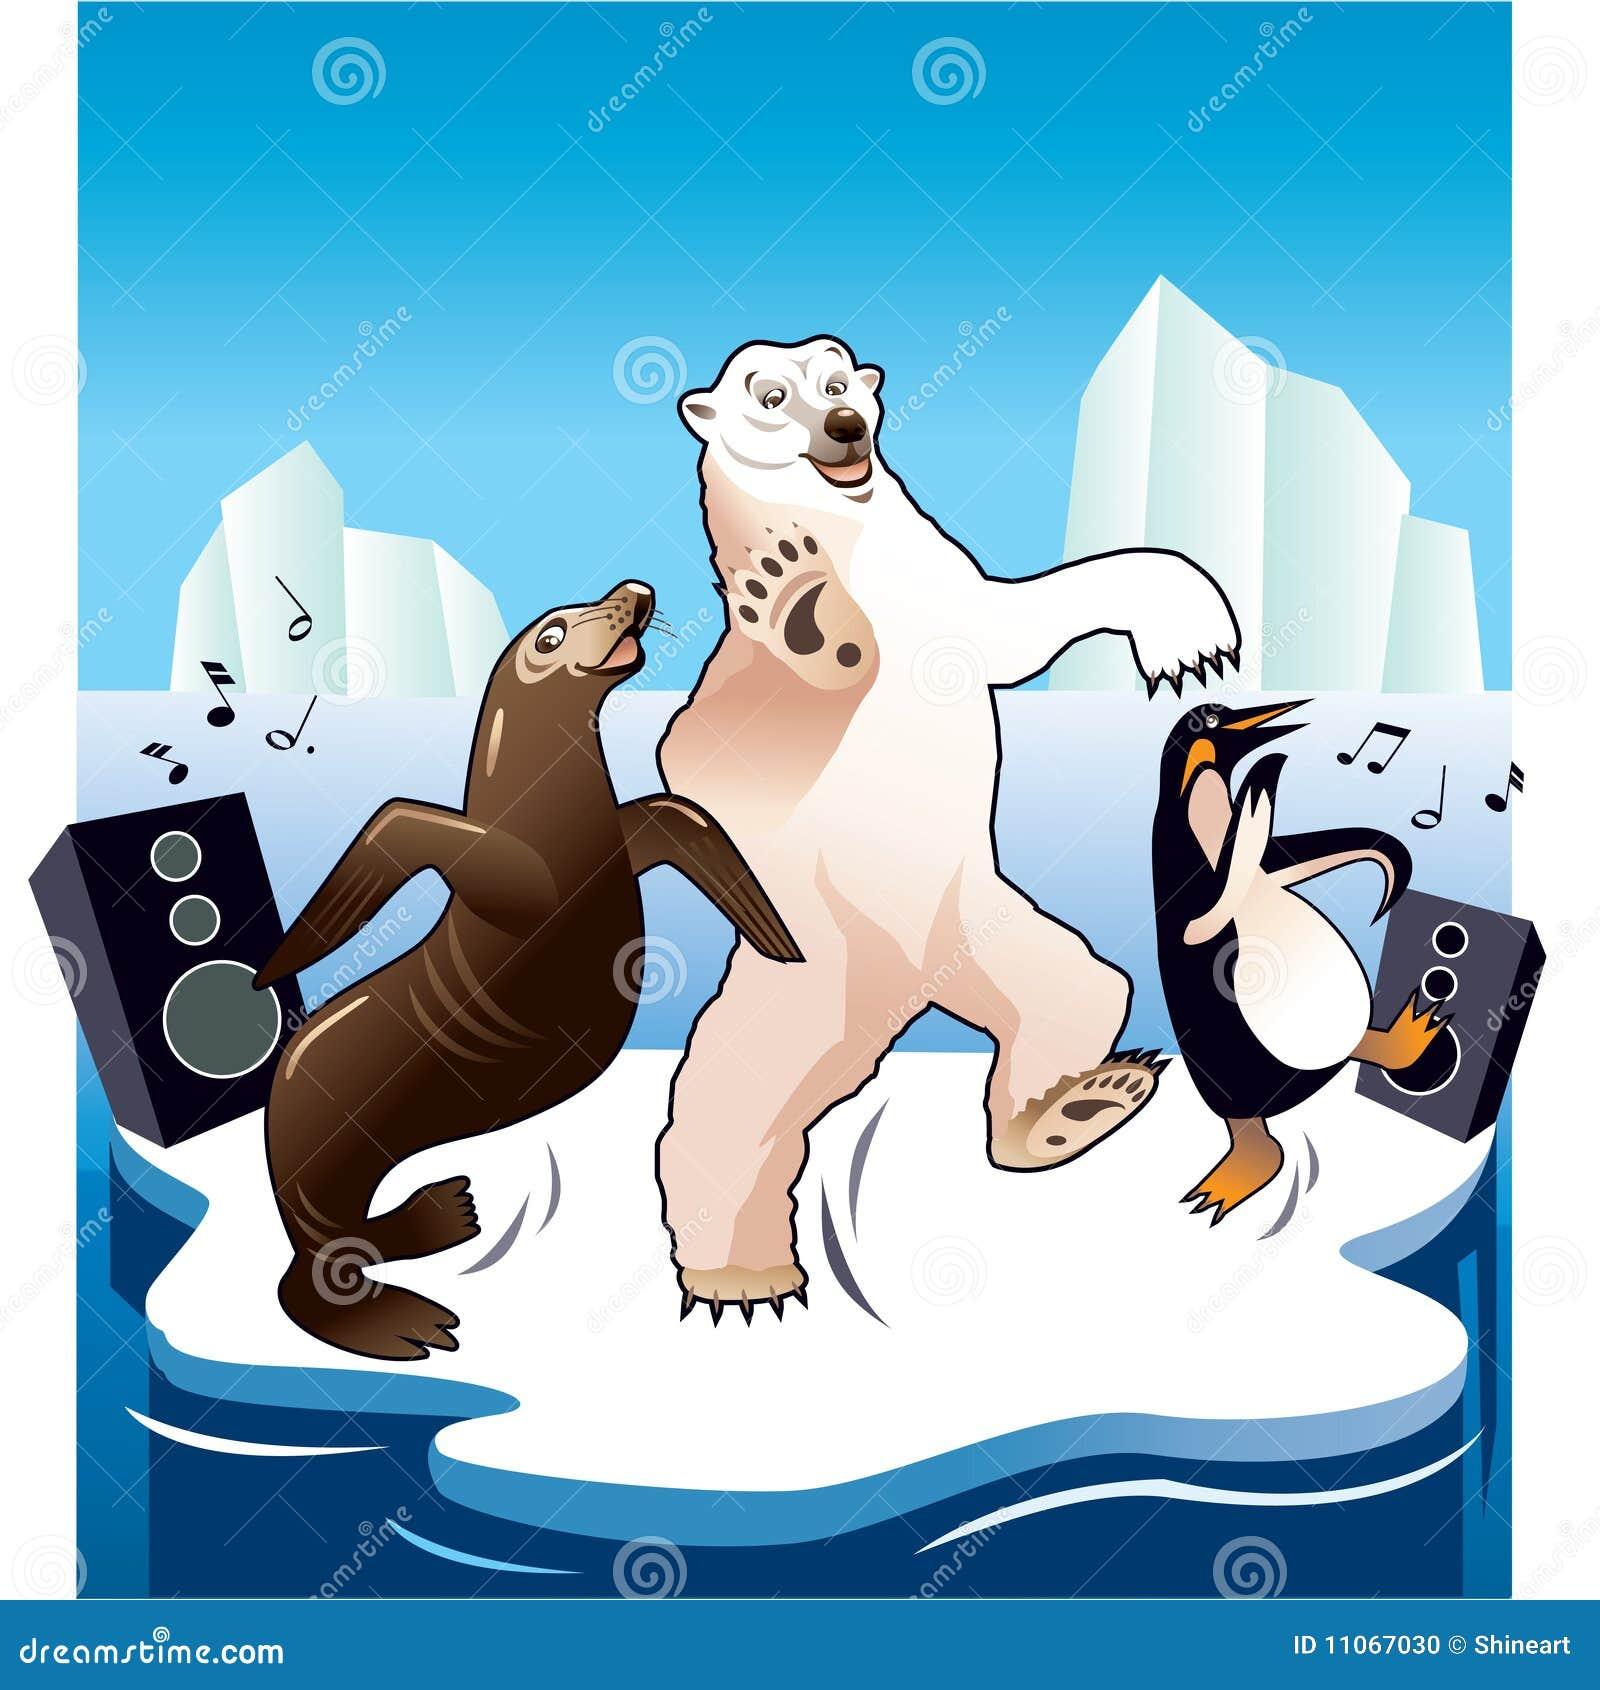 North pole party